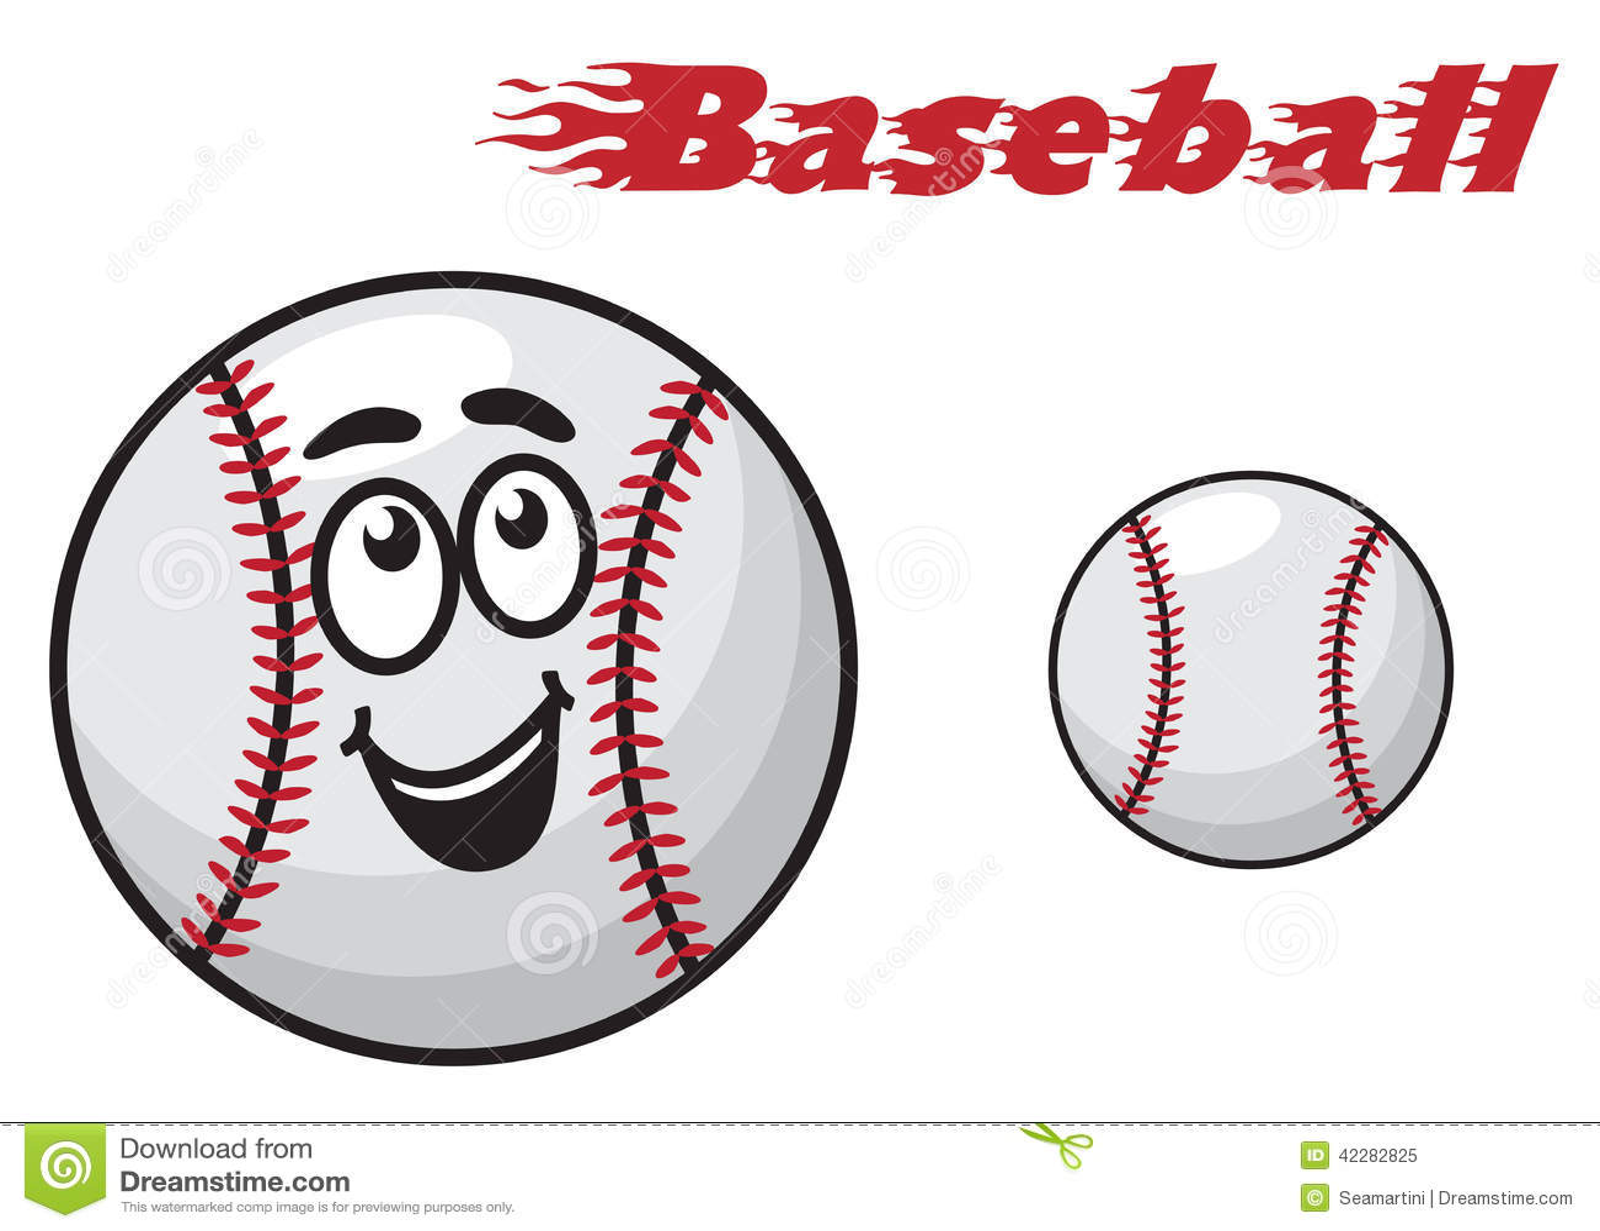 baseball cartoon ball stock vector illustration of base 42282825